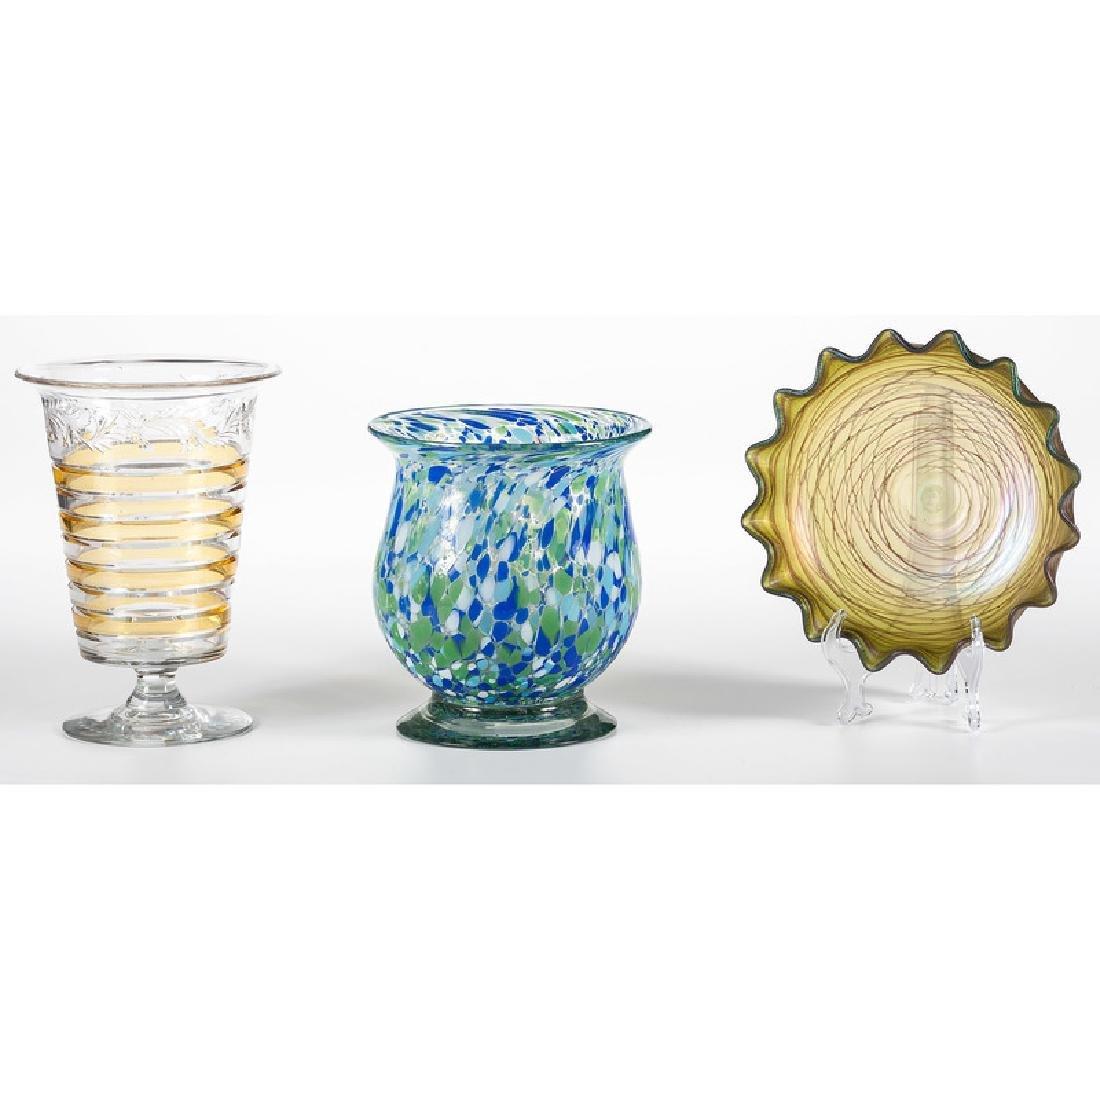 Art Glass Vase and Bowl, Plus